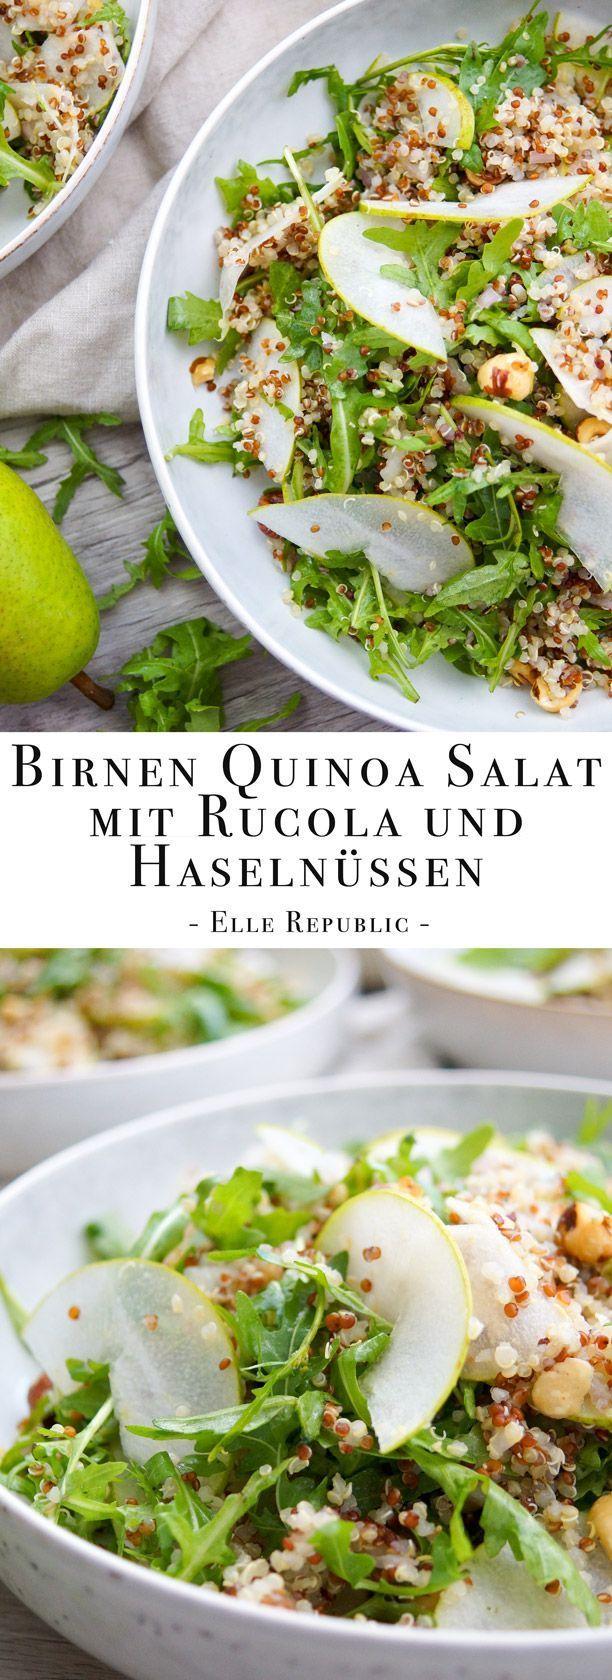 Photo of Pear Quinoa Salad with Arugula and Hazelnuts | Elle Republic